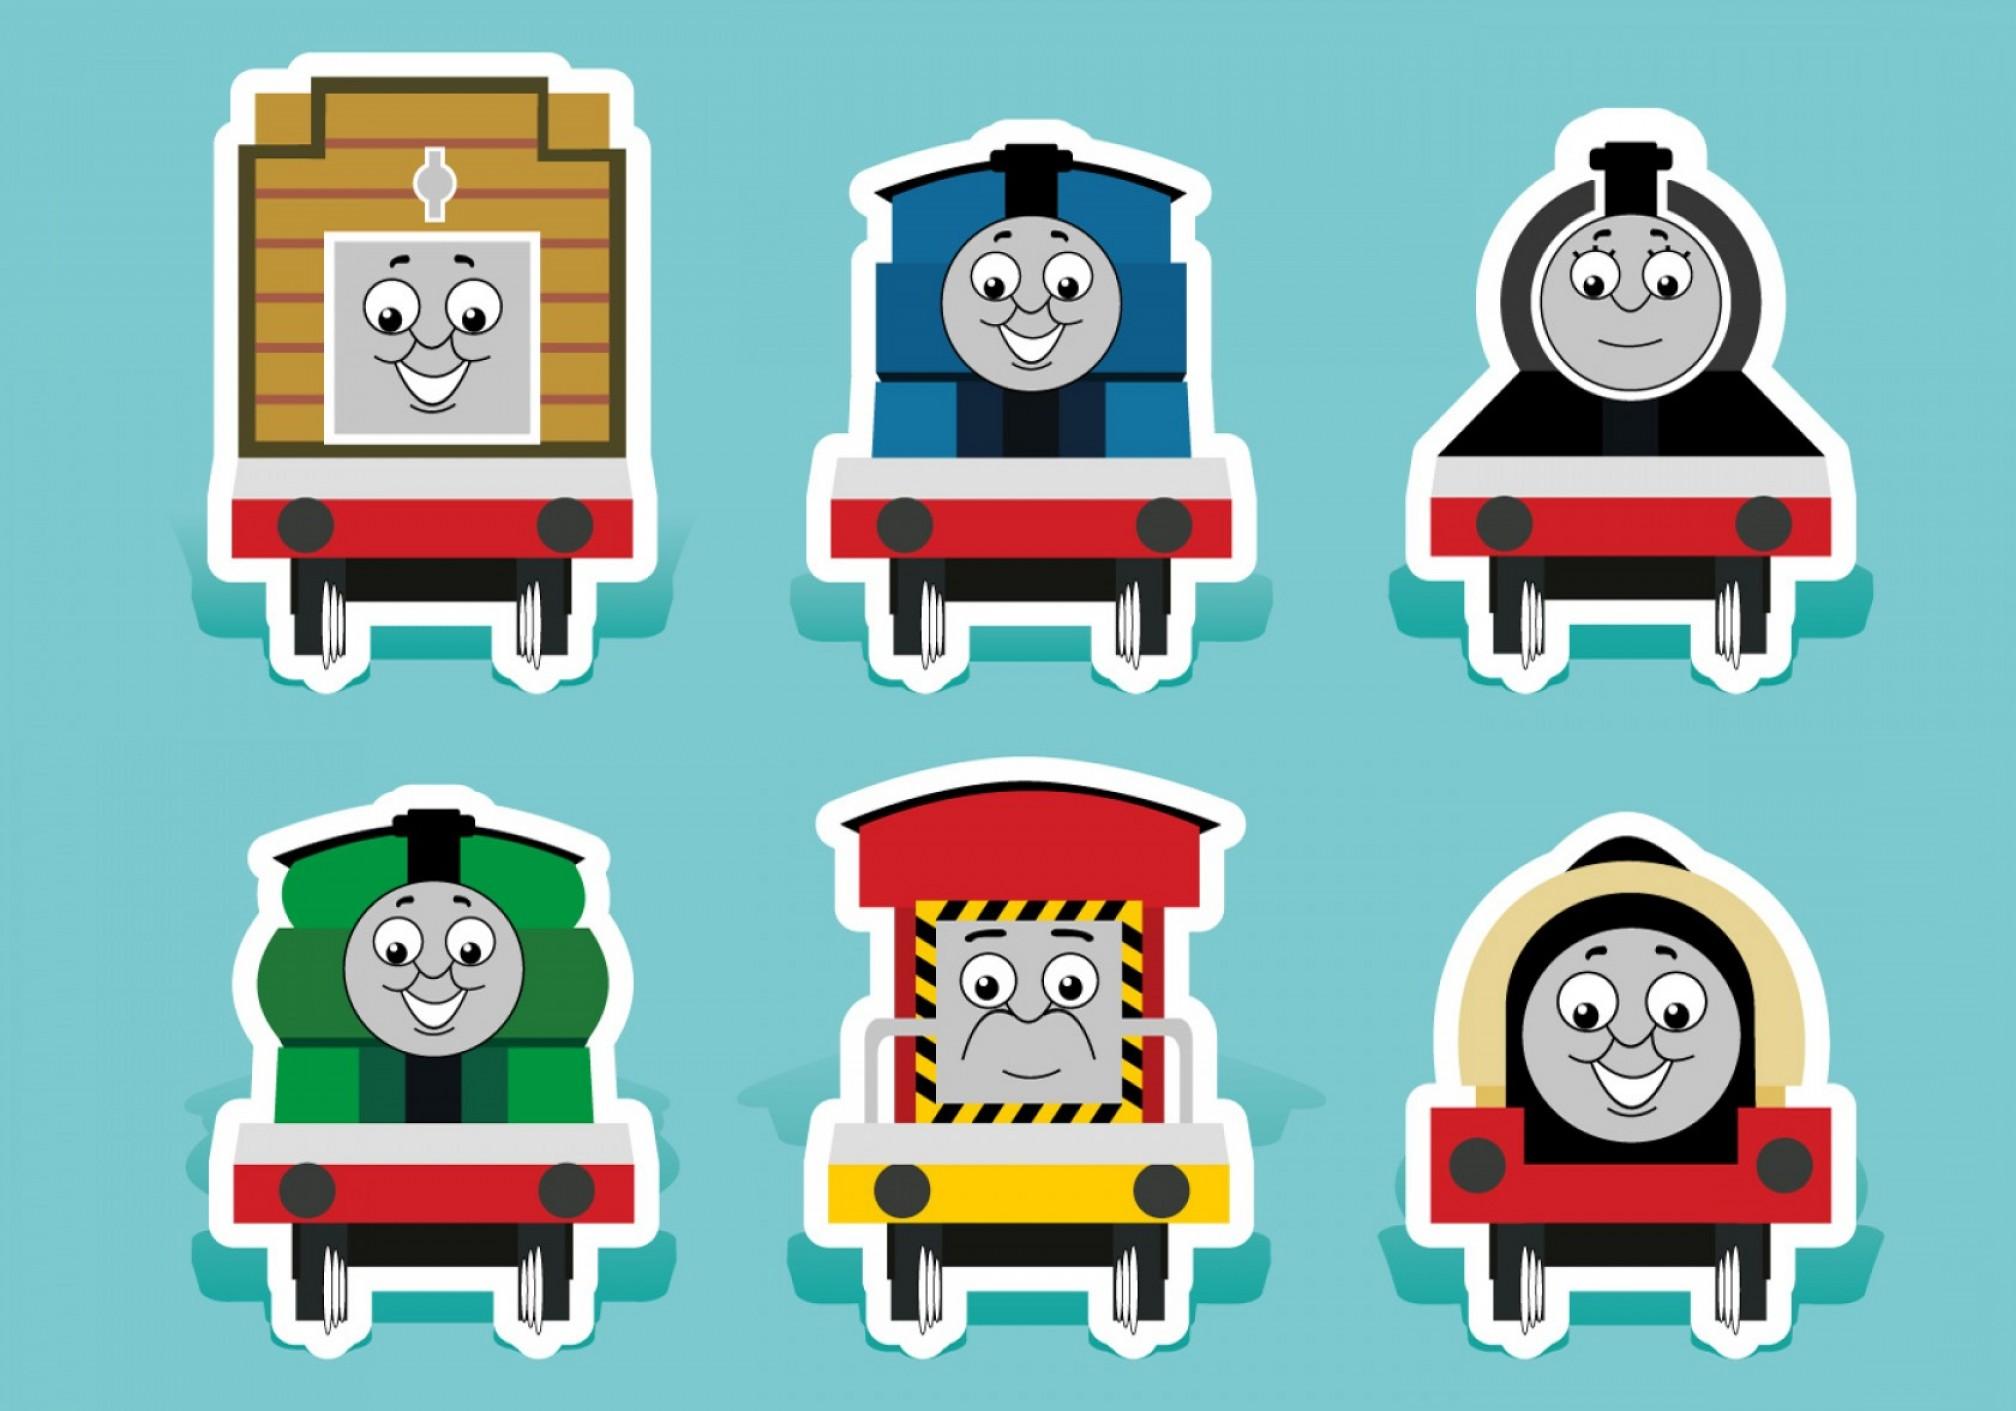 2016x1411 Free Vector Thomas The Train Vectors Shopatcloth